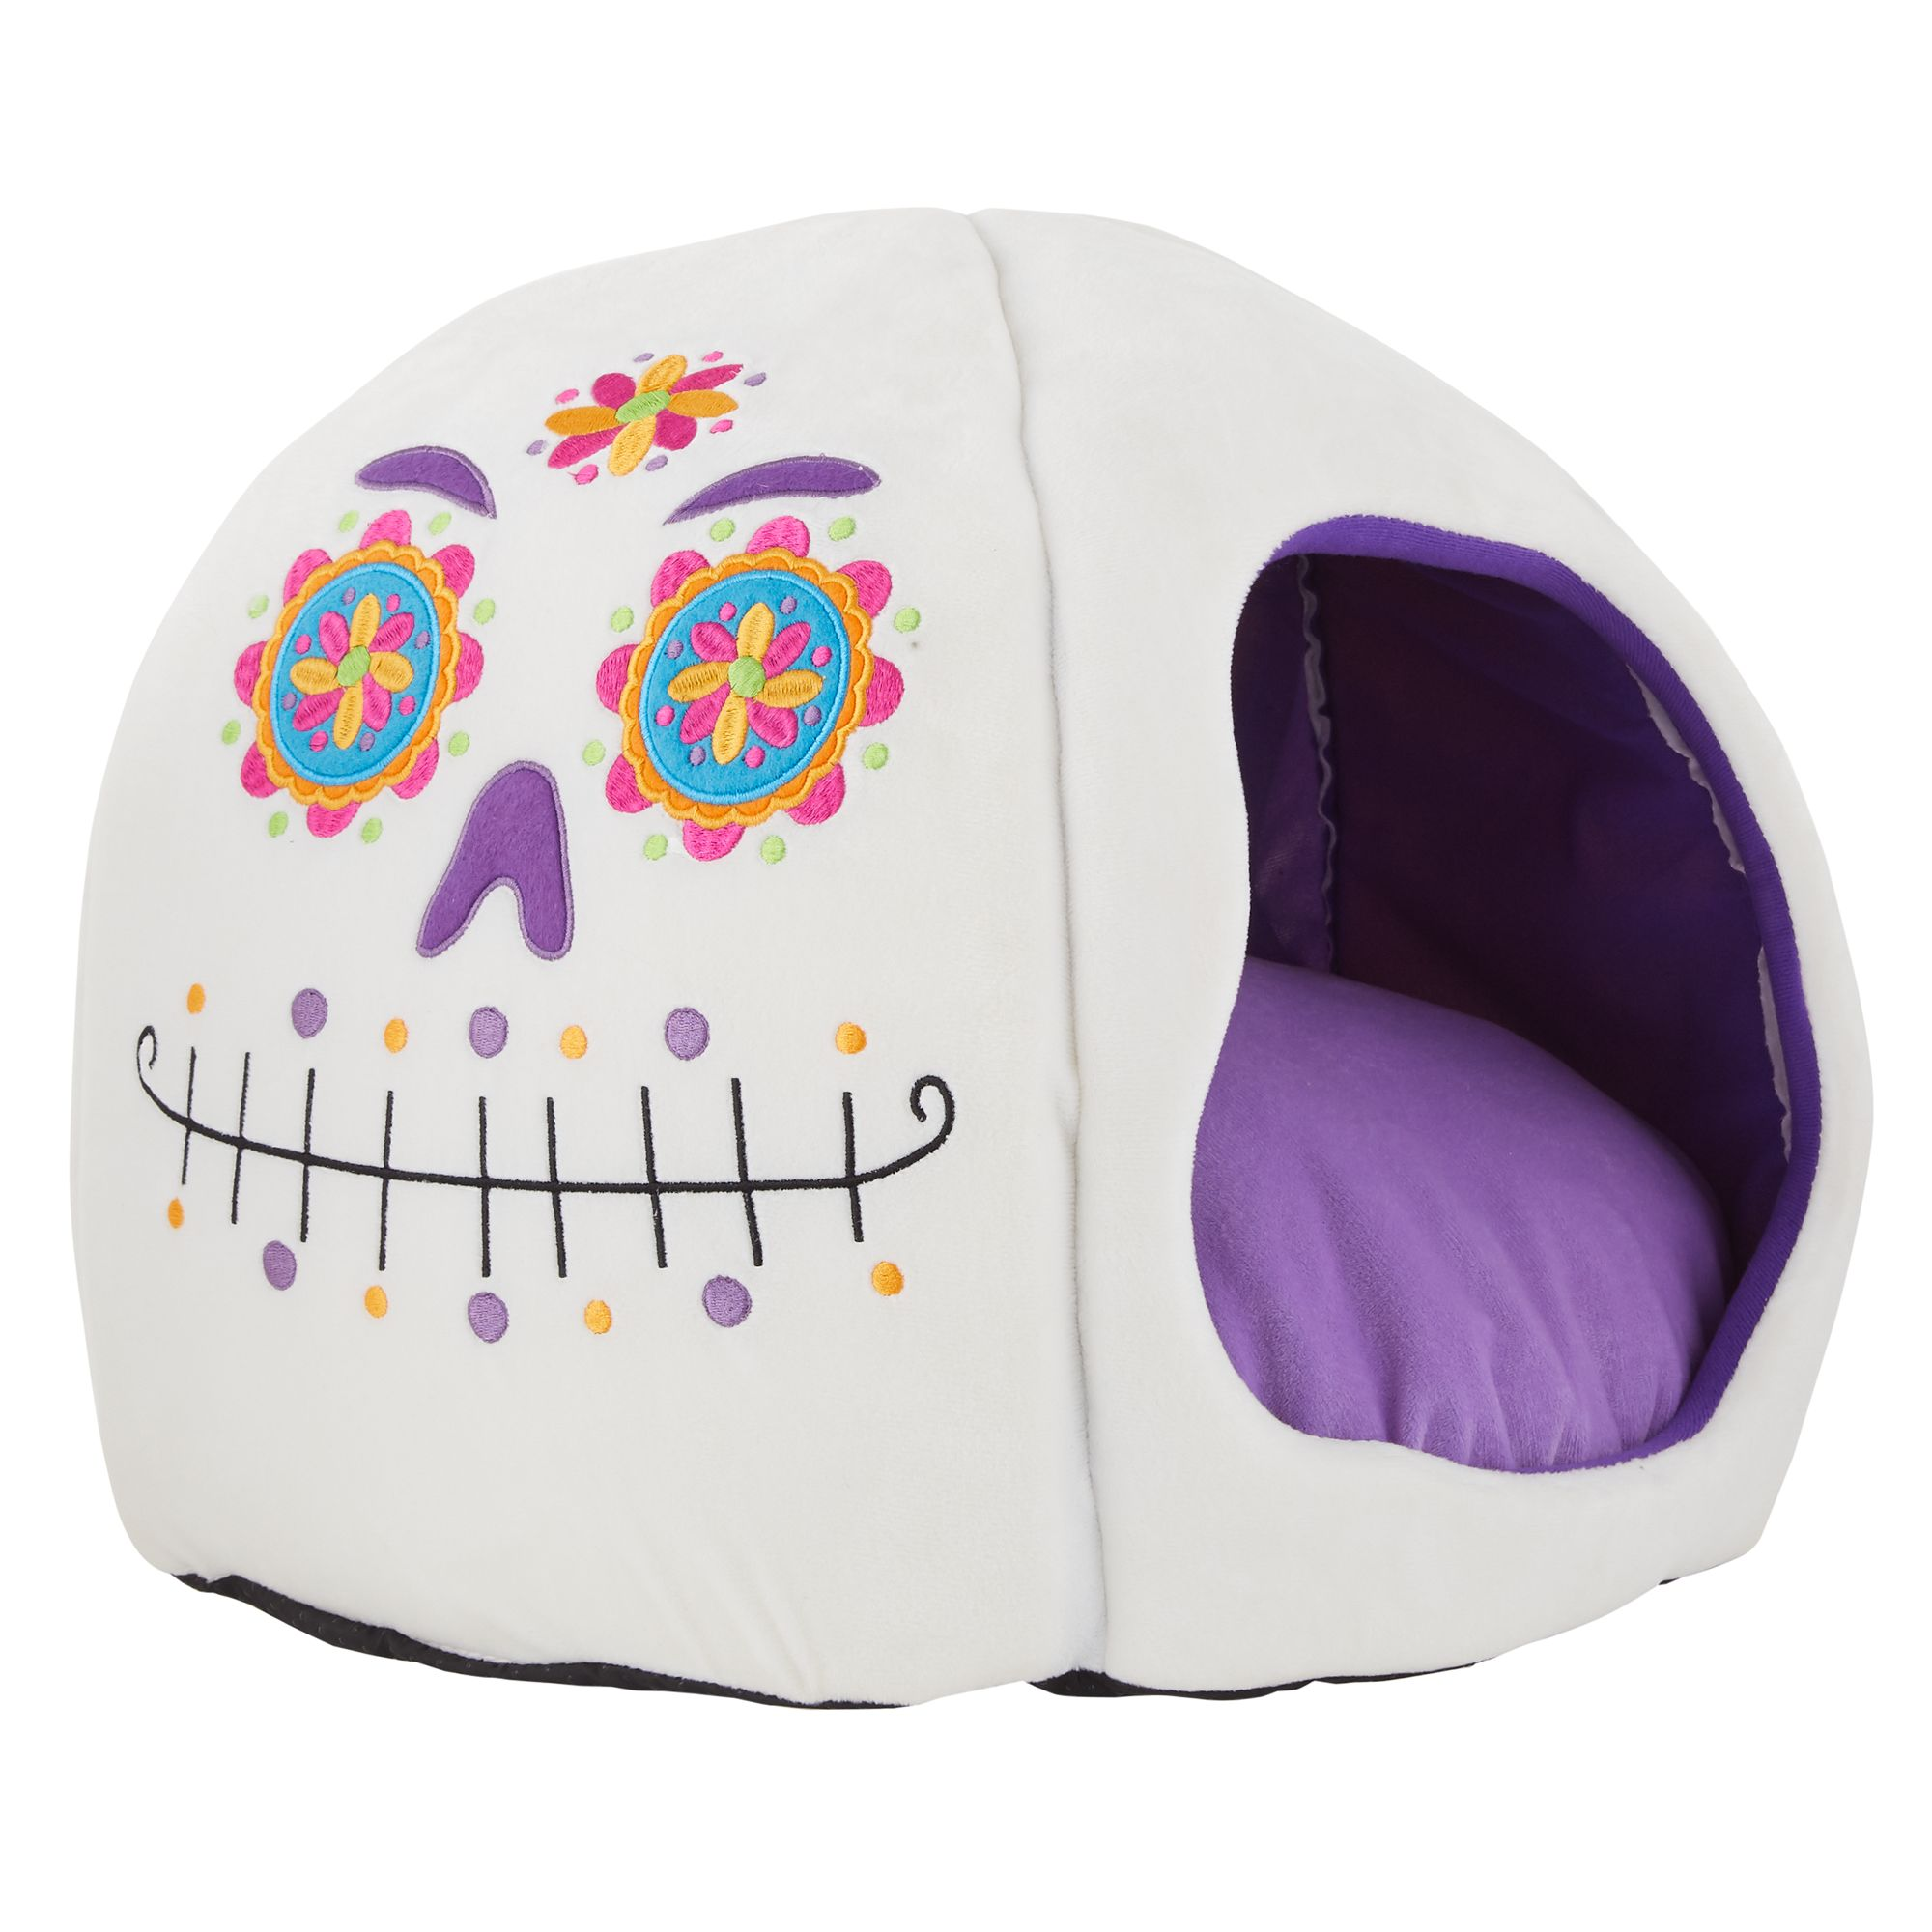 Stupendous Thrills Chills Halloween Sugar Skull Hut Pet Bed Ibusinesslaw Wood Chair Design Ideas Ibusinesslaworg